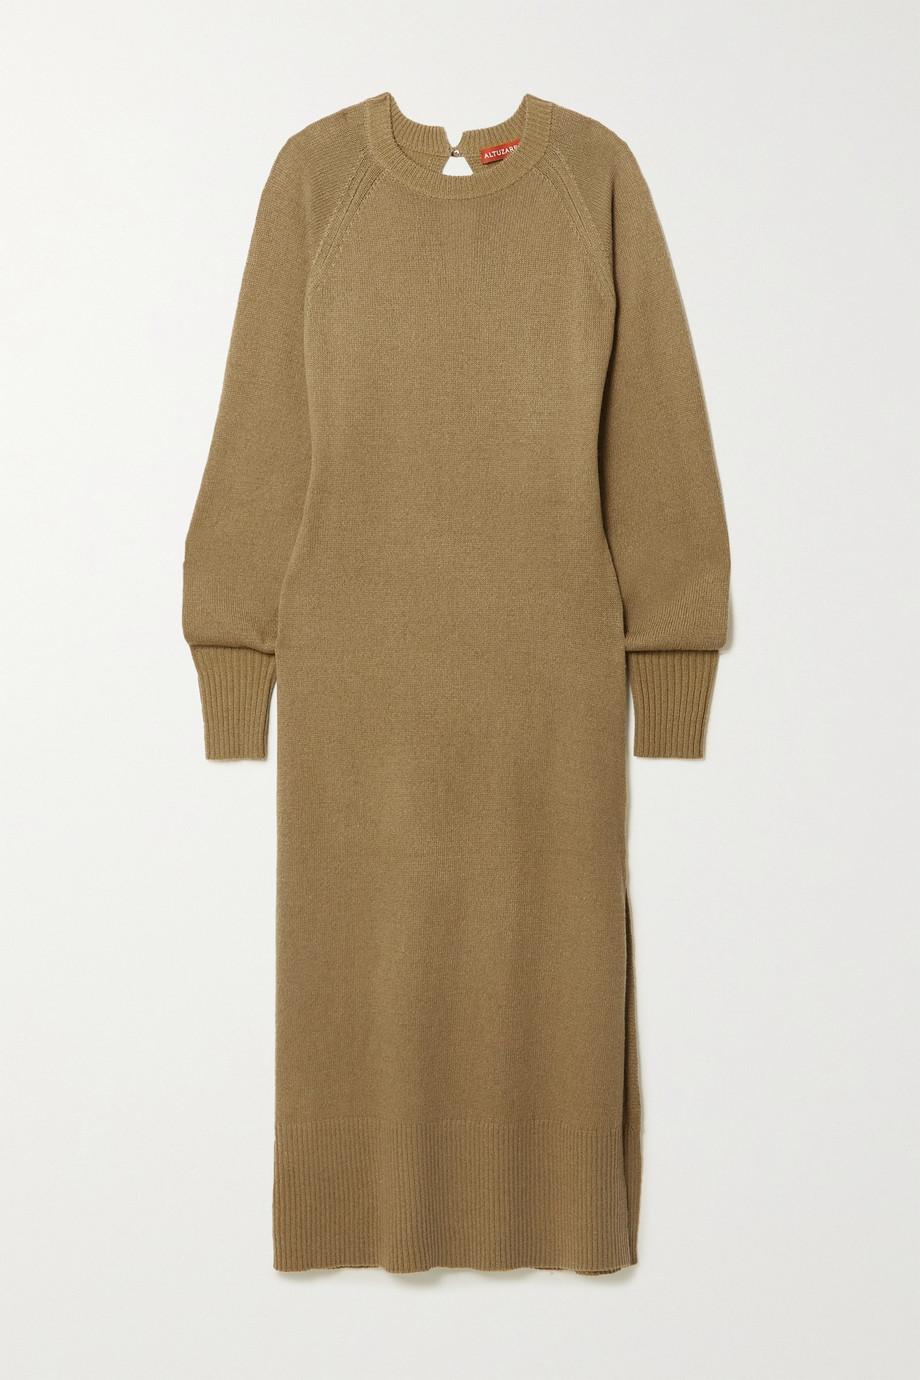 Altuzarra Chamomile cashmere and cotton-blend midi dress